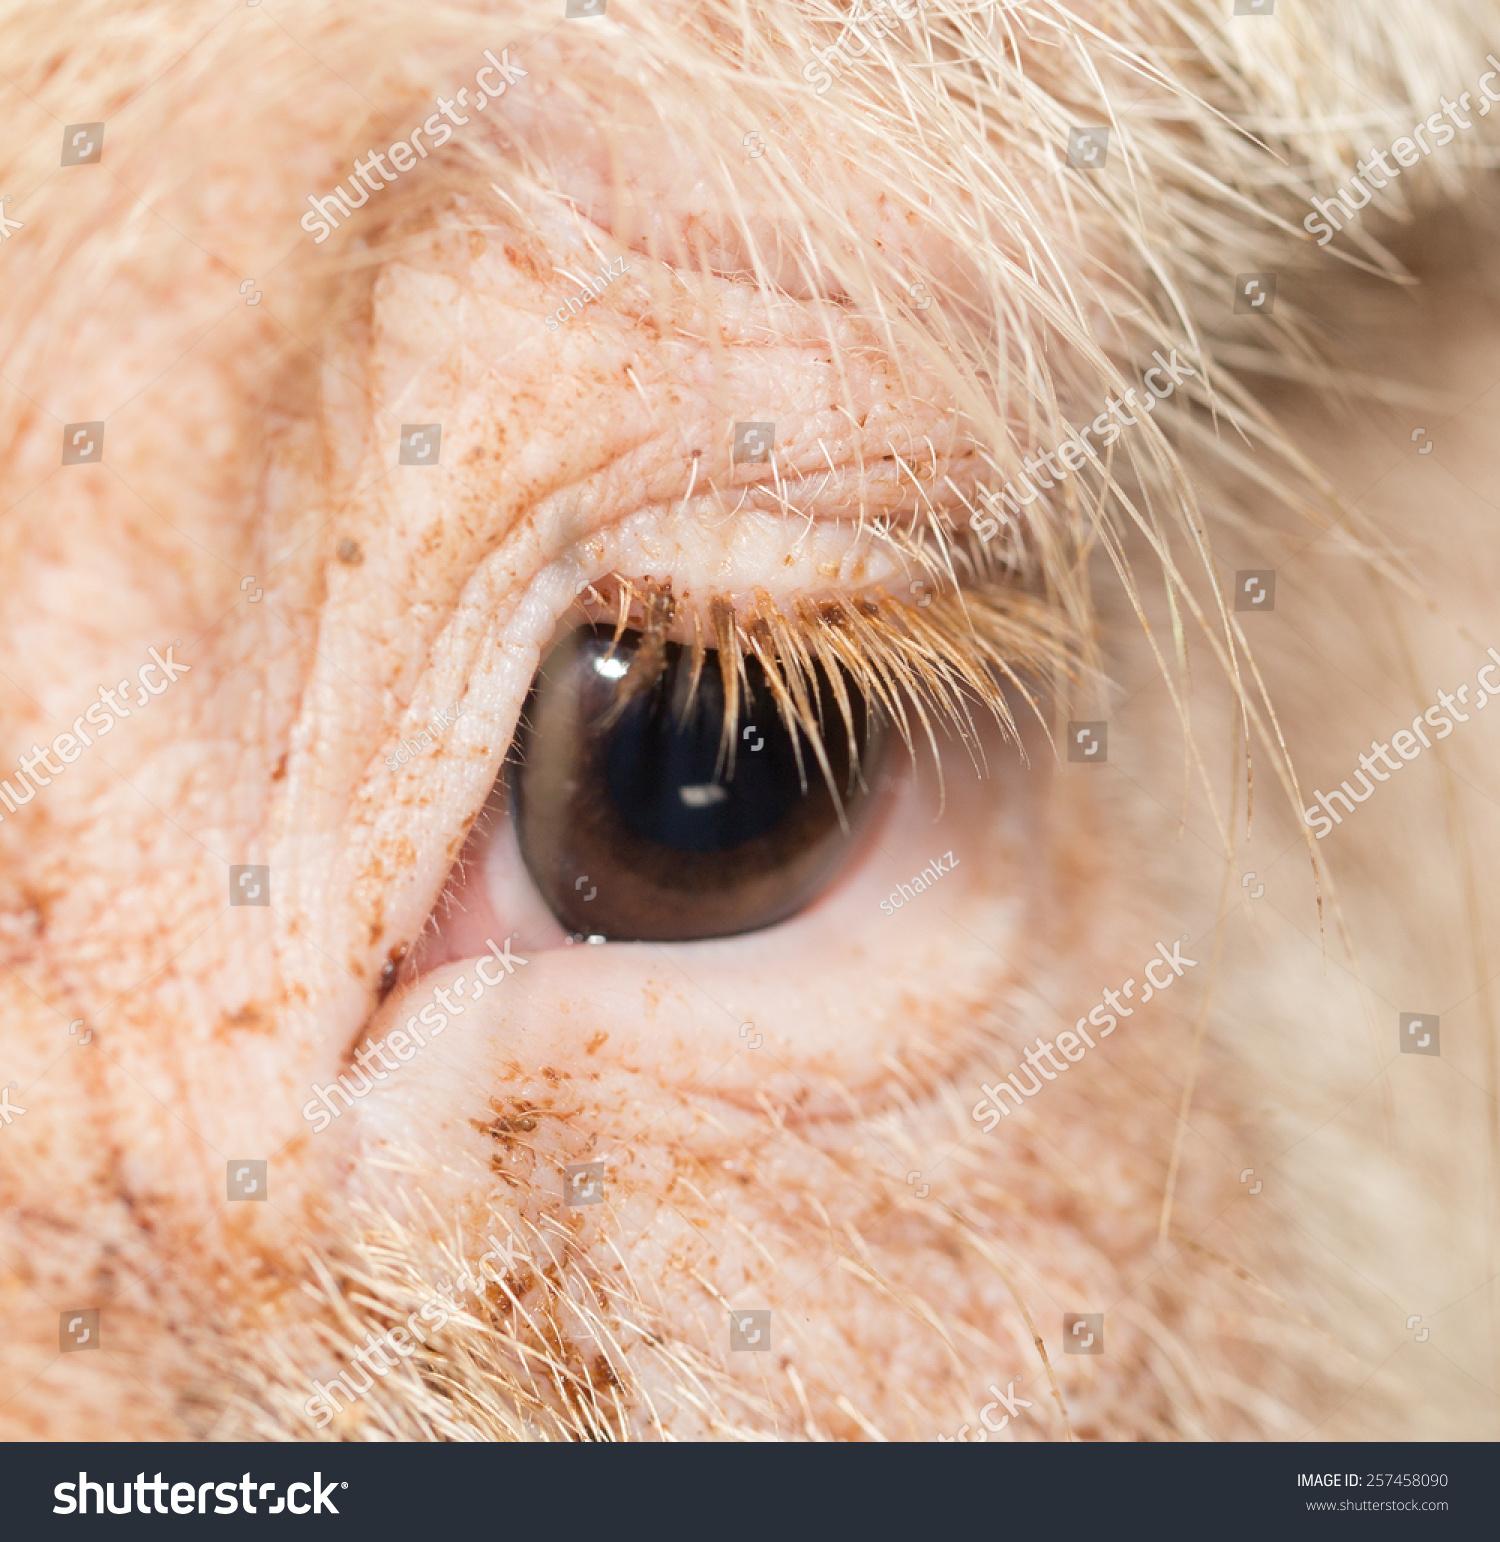 Pig Eyes Closeup Stock Photo Edit Now 257458090 Shutterstock